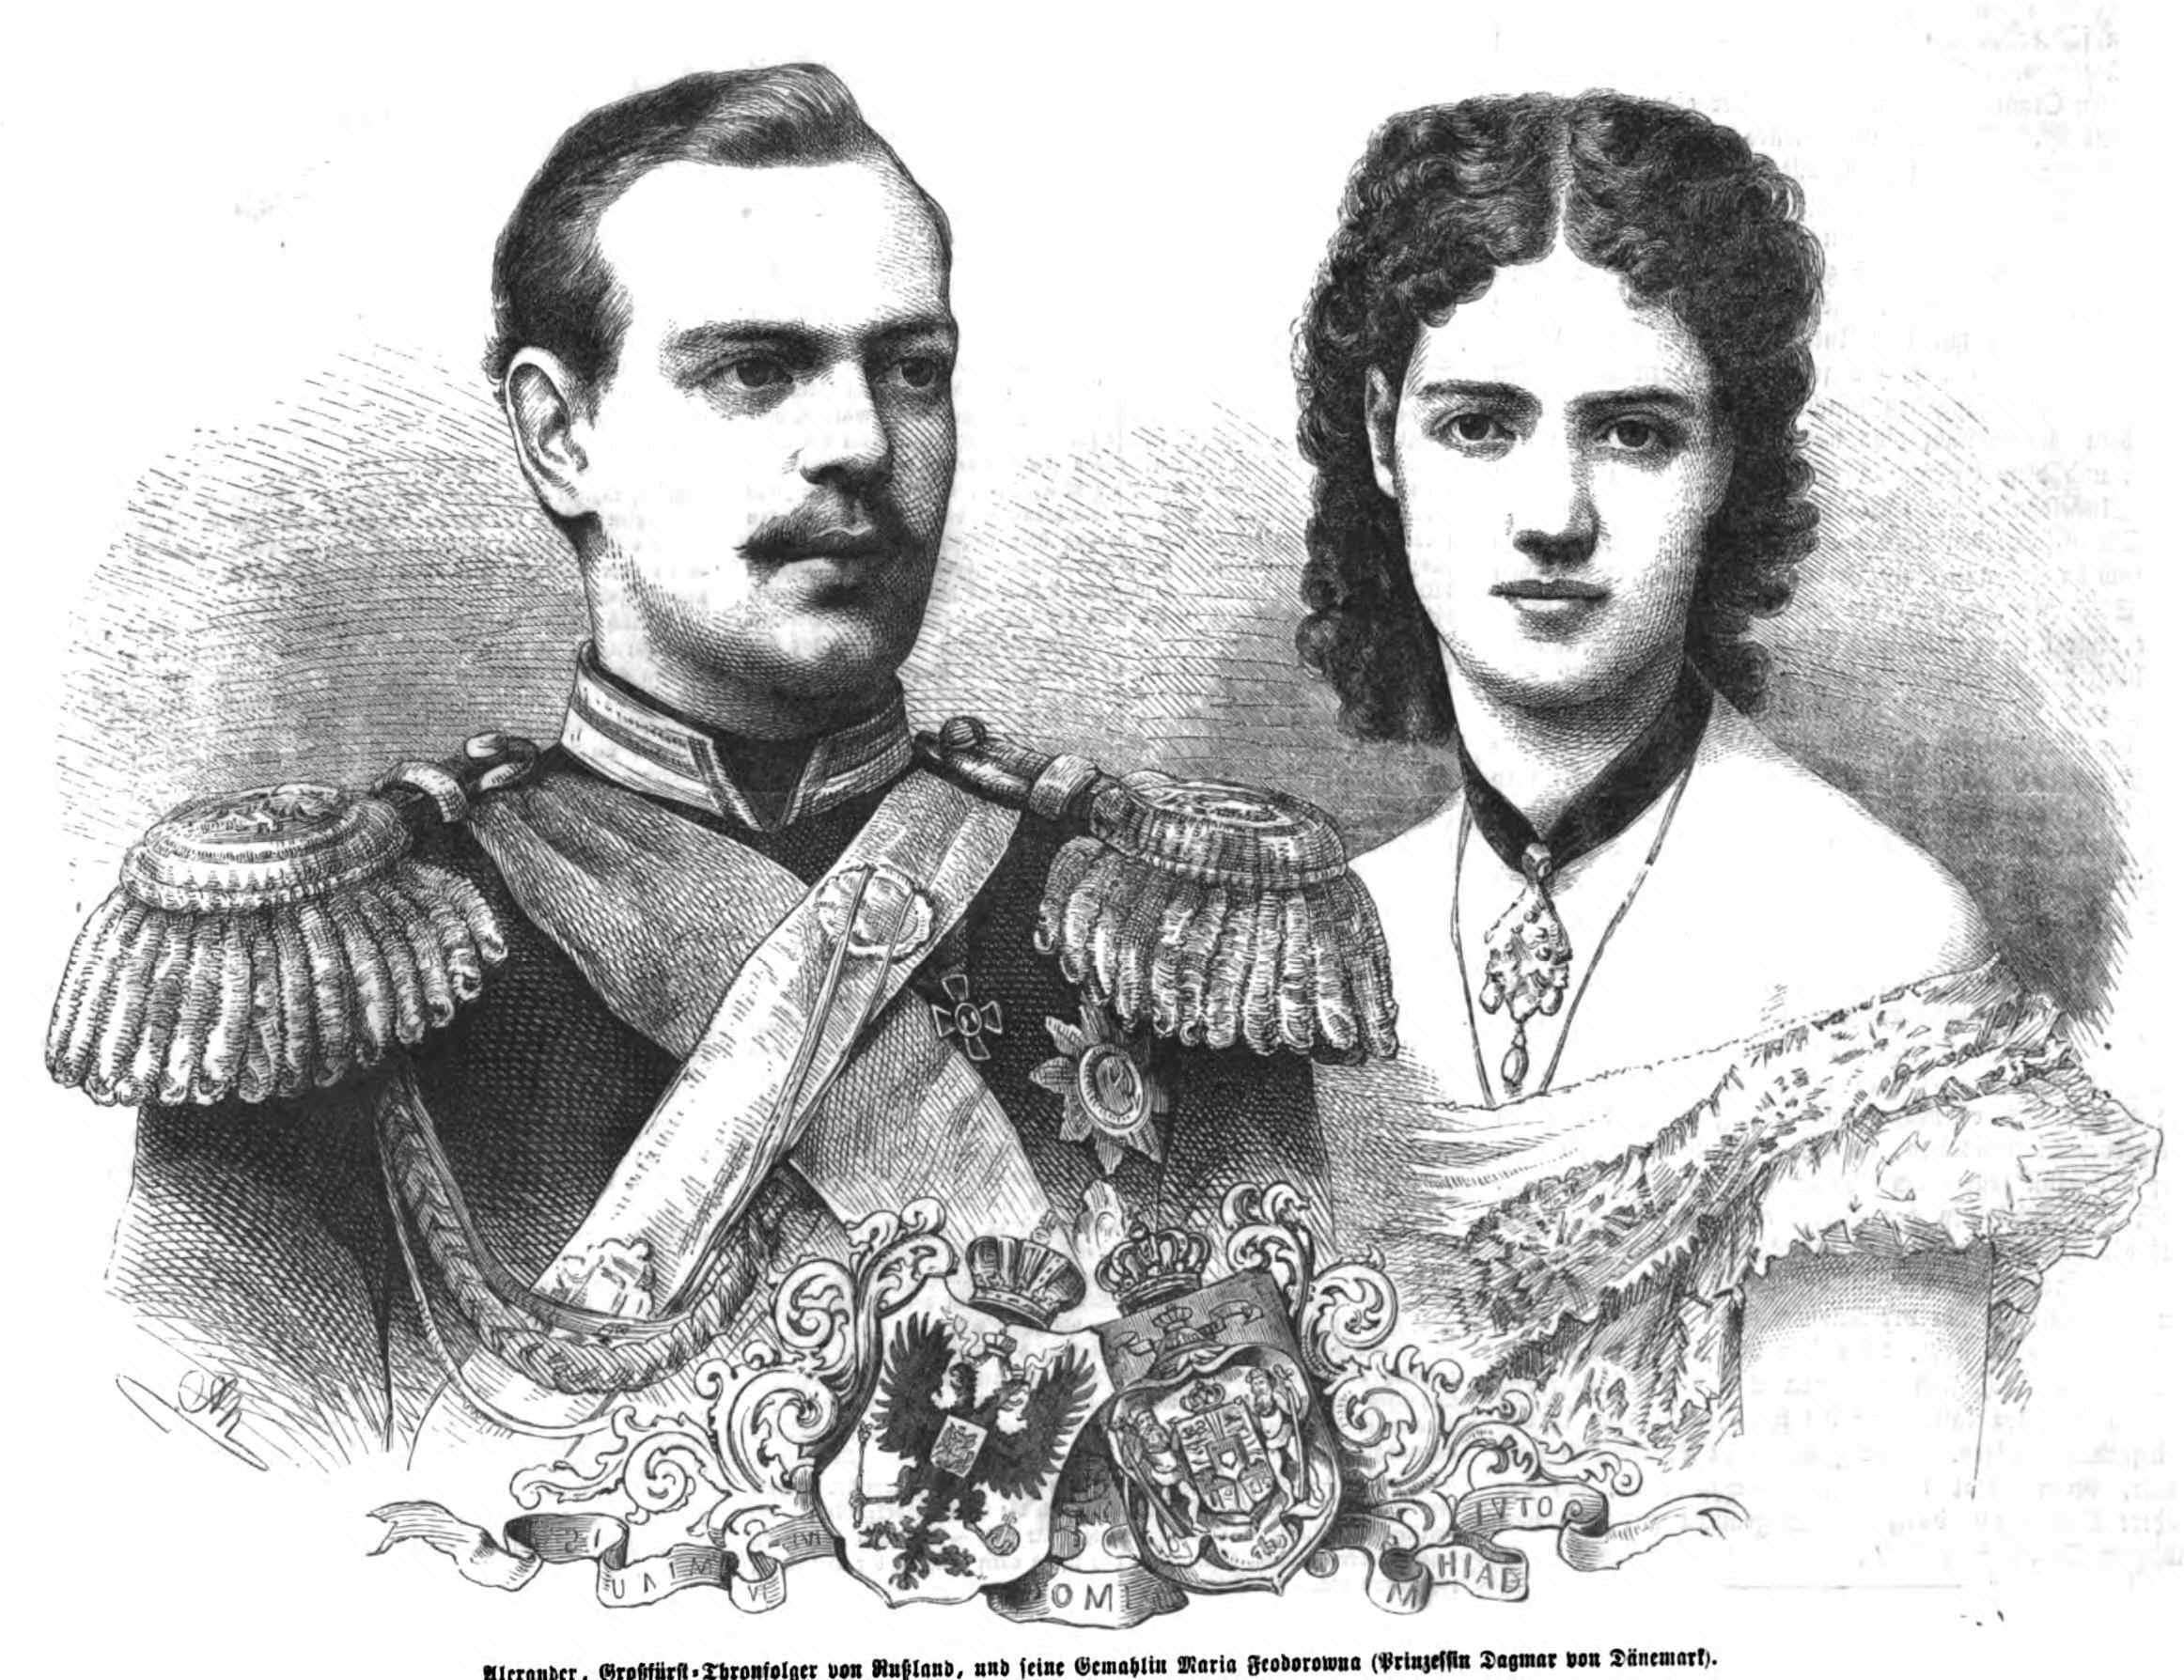 http://russlovo.today/files/project_4311/img/08.15.NeEvro/Imperator_Aleksandr_III_i_ego_zhena_princessa_Dagmara_Datskaya.jpg